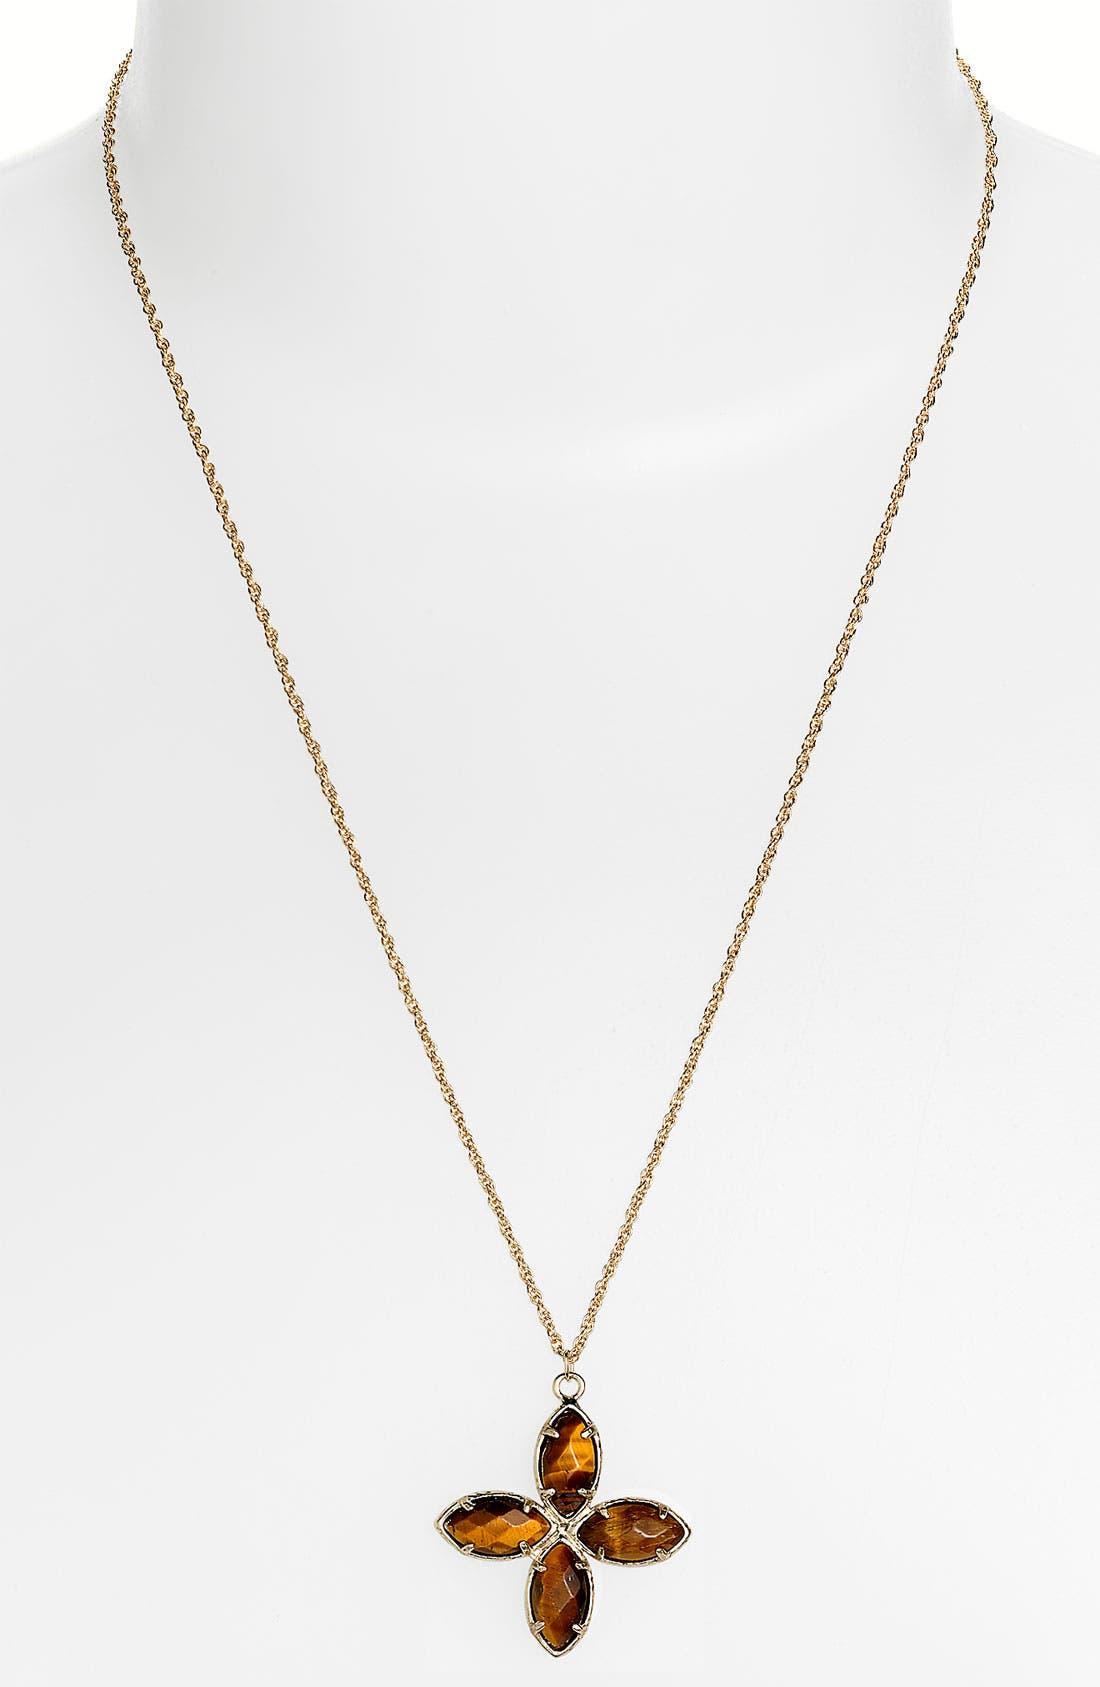 Main Image - Kendra Scott 'Thandi' Pendant Necklace